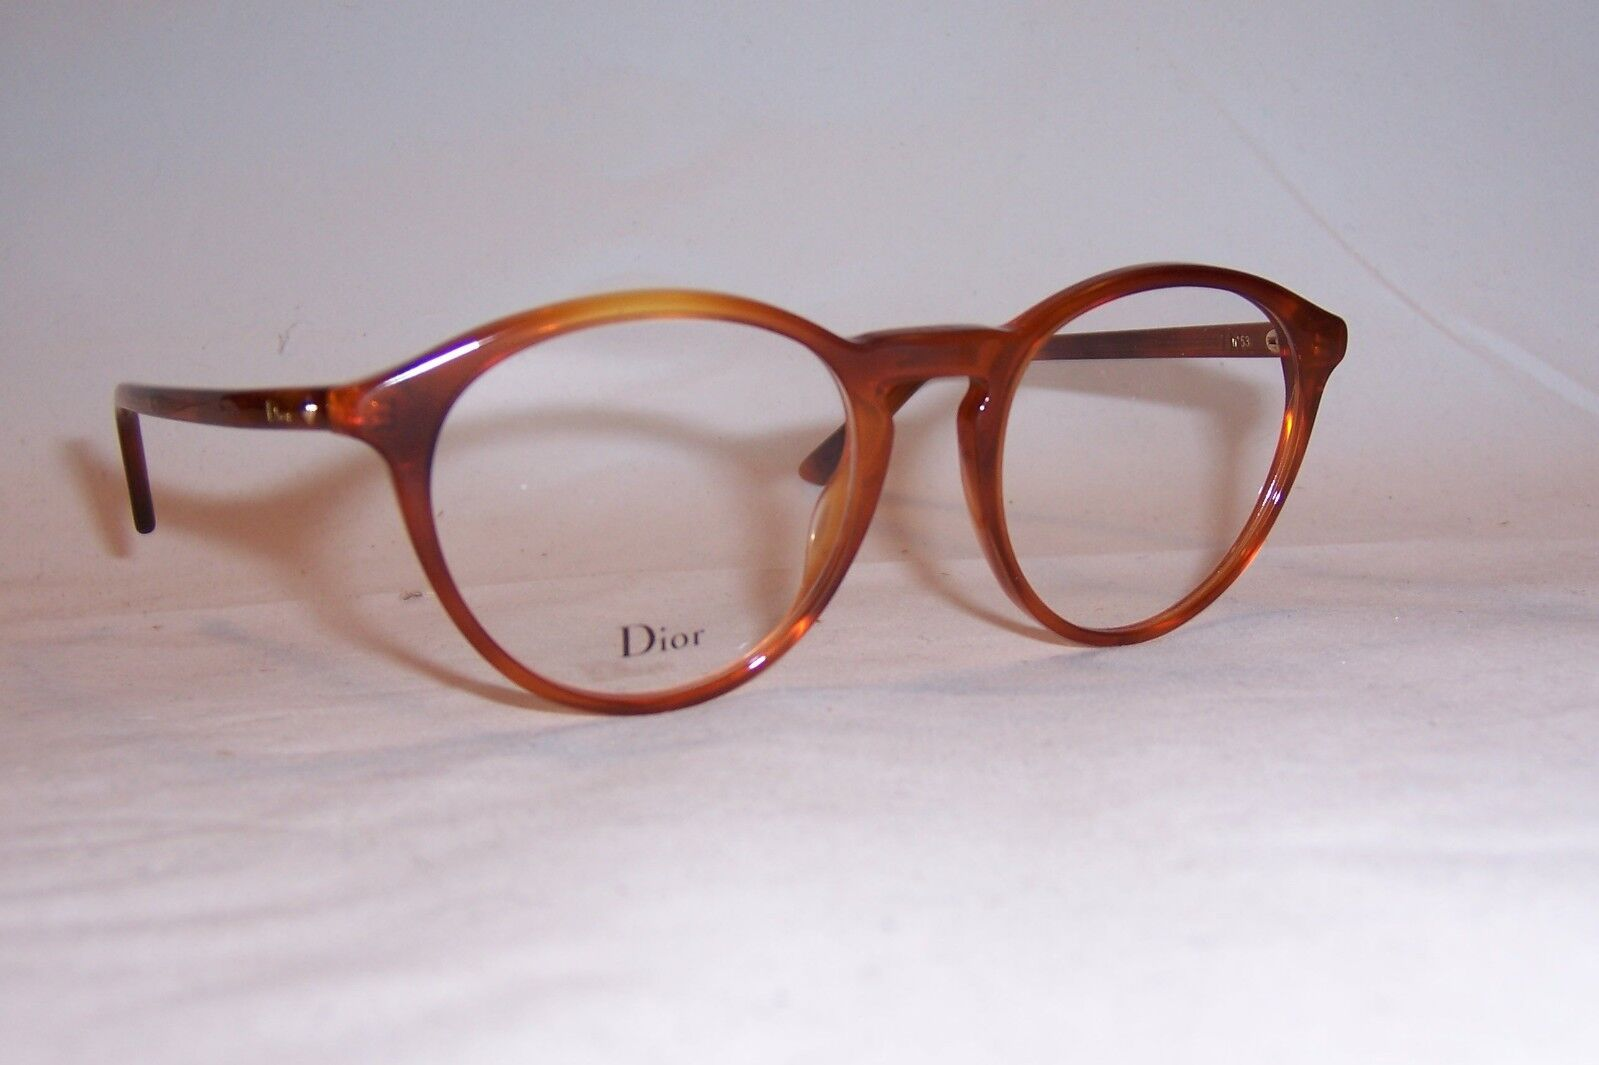 559bcf8350 Christian Dior Eyeglasses CD Montaigne 53 Sx7 Havana 50mm RX ...